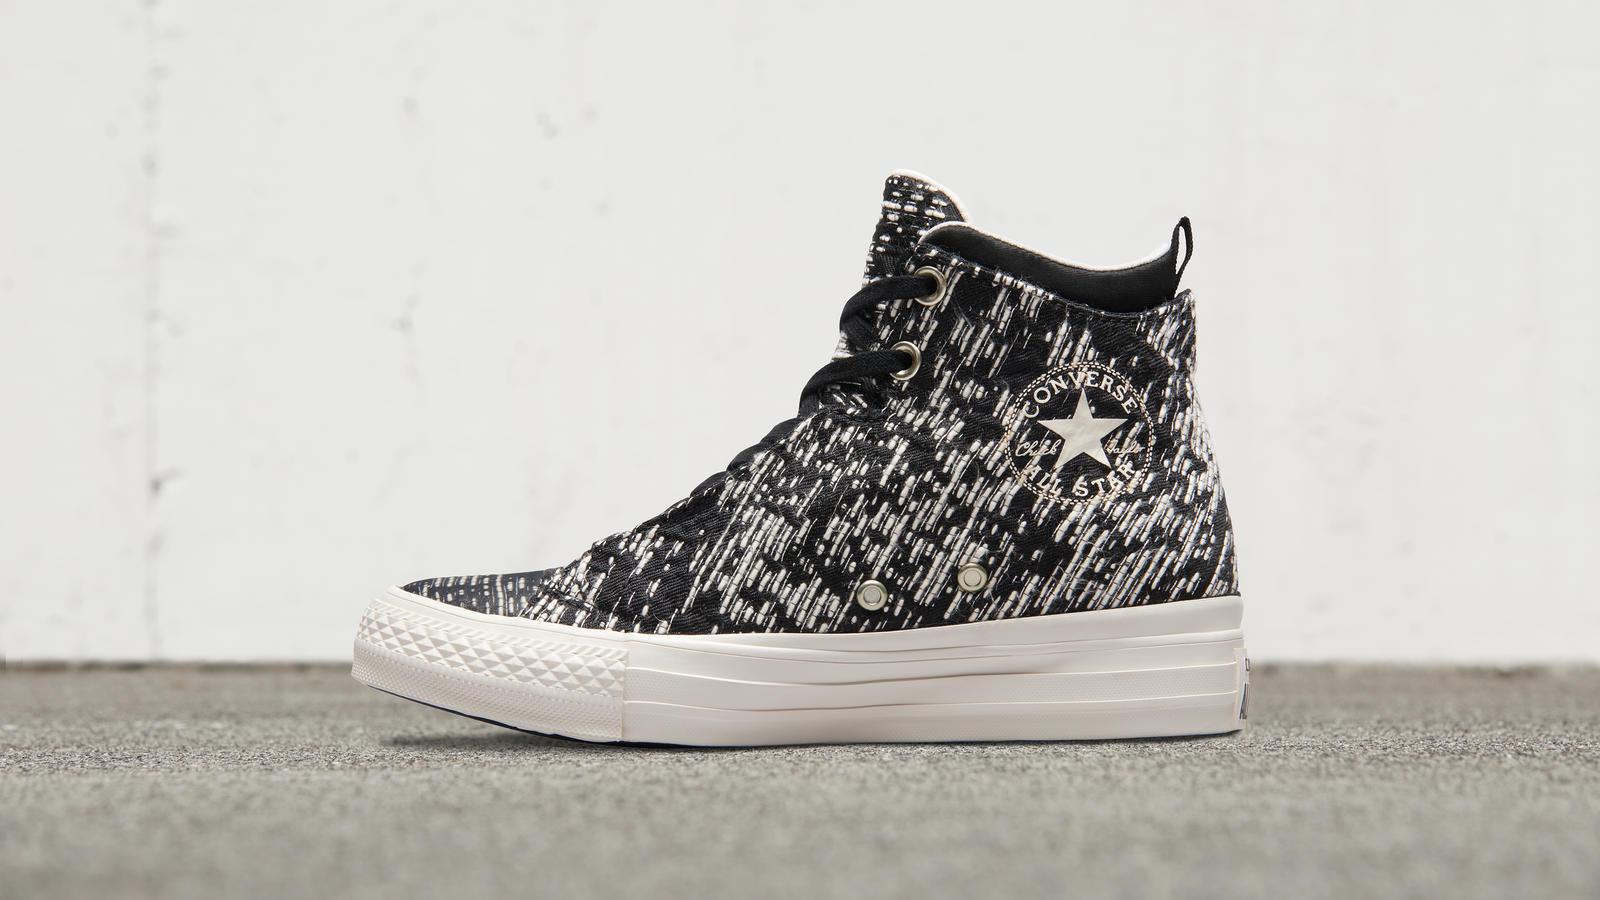 converse-all-star-winter-knit-selene01